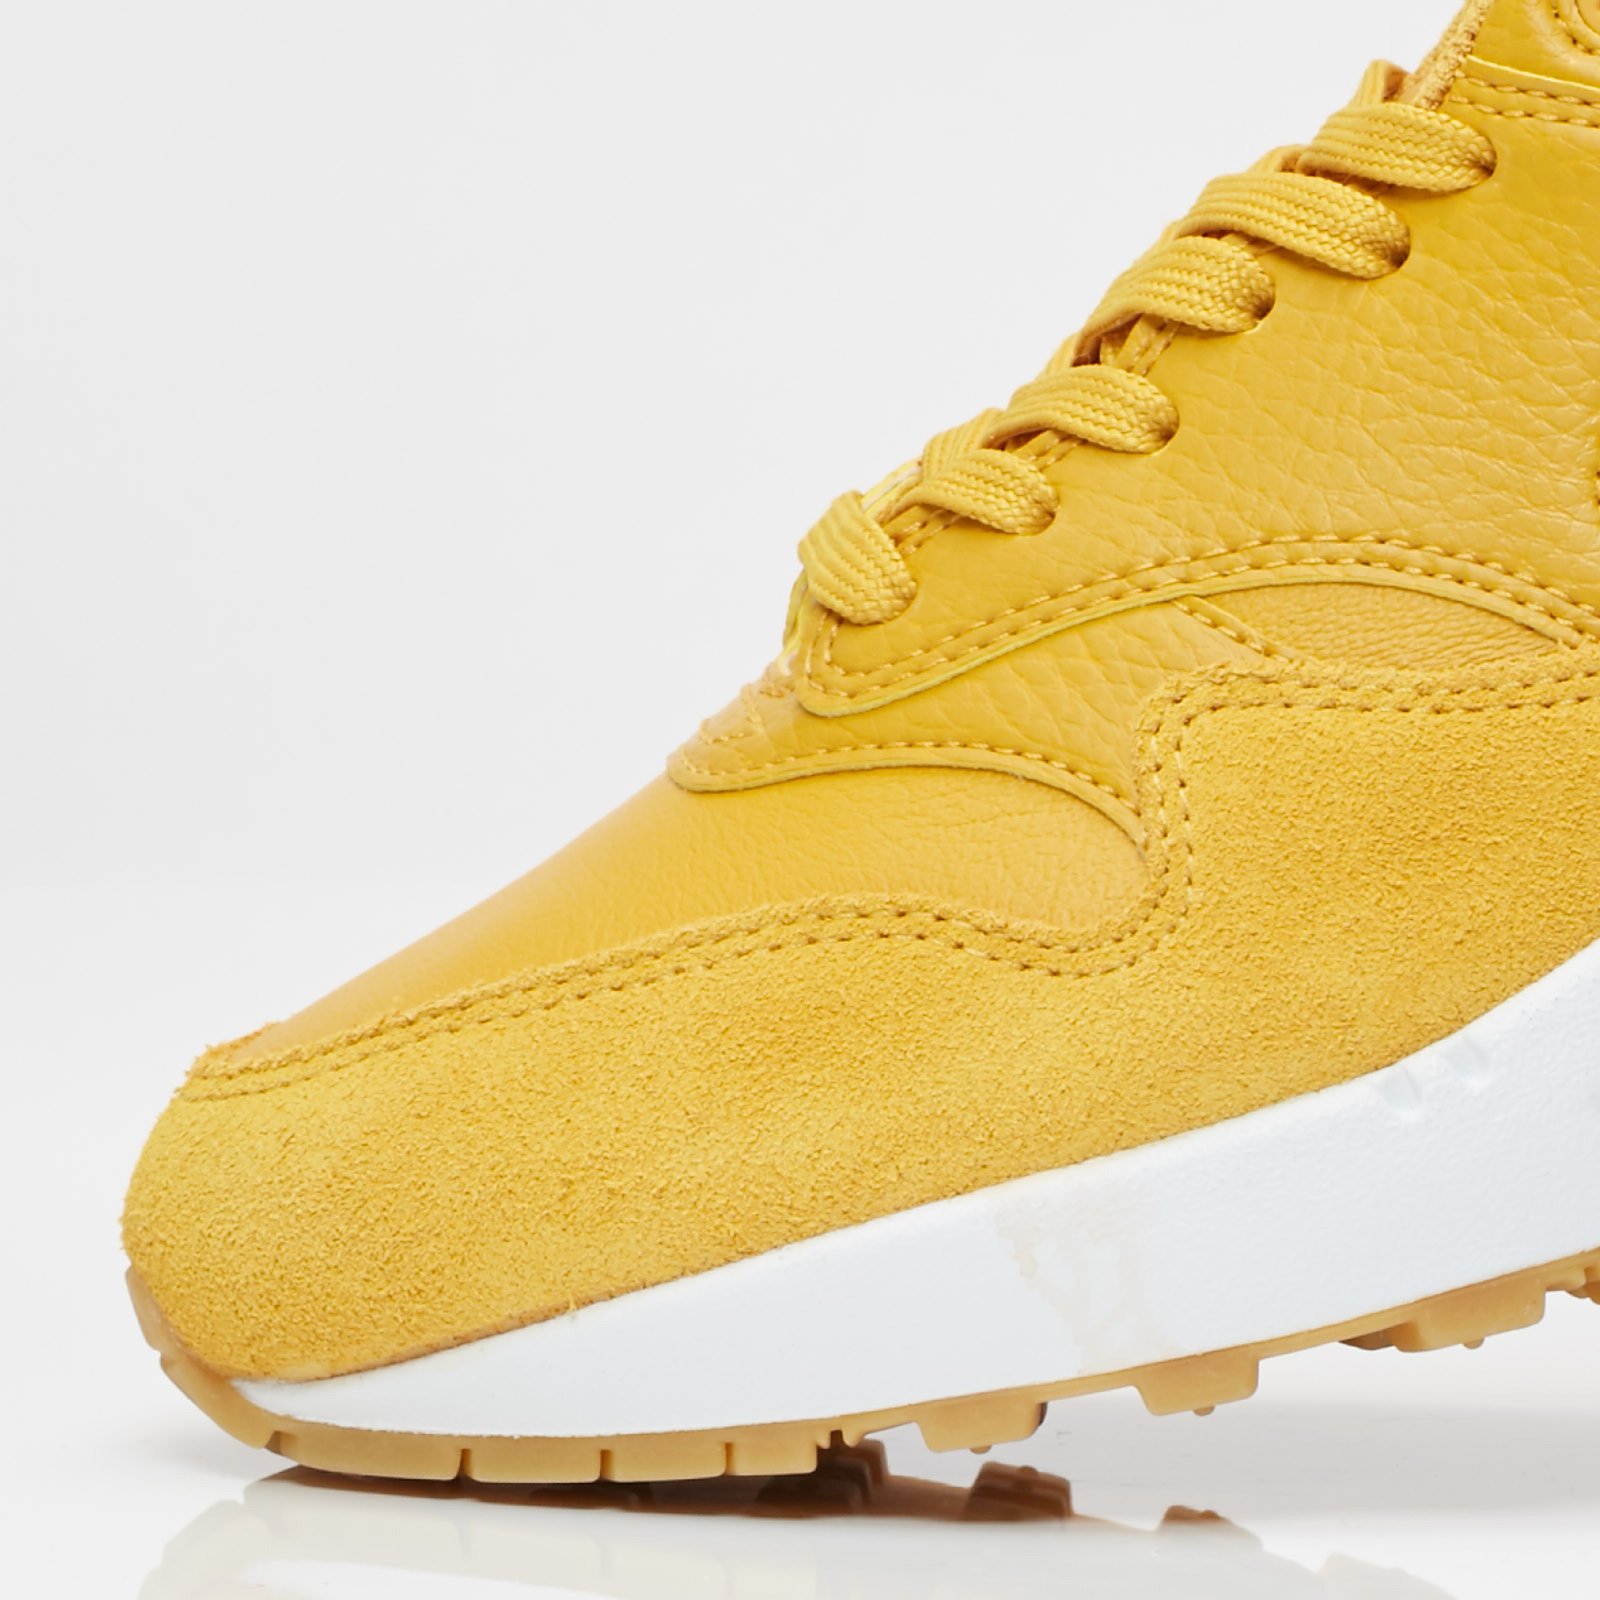 best service 2de73 9f91b ... Nike Sportswear Wmns Air Max 1 Premium SC ...